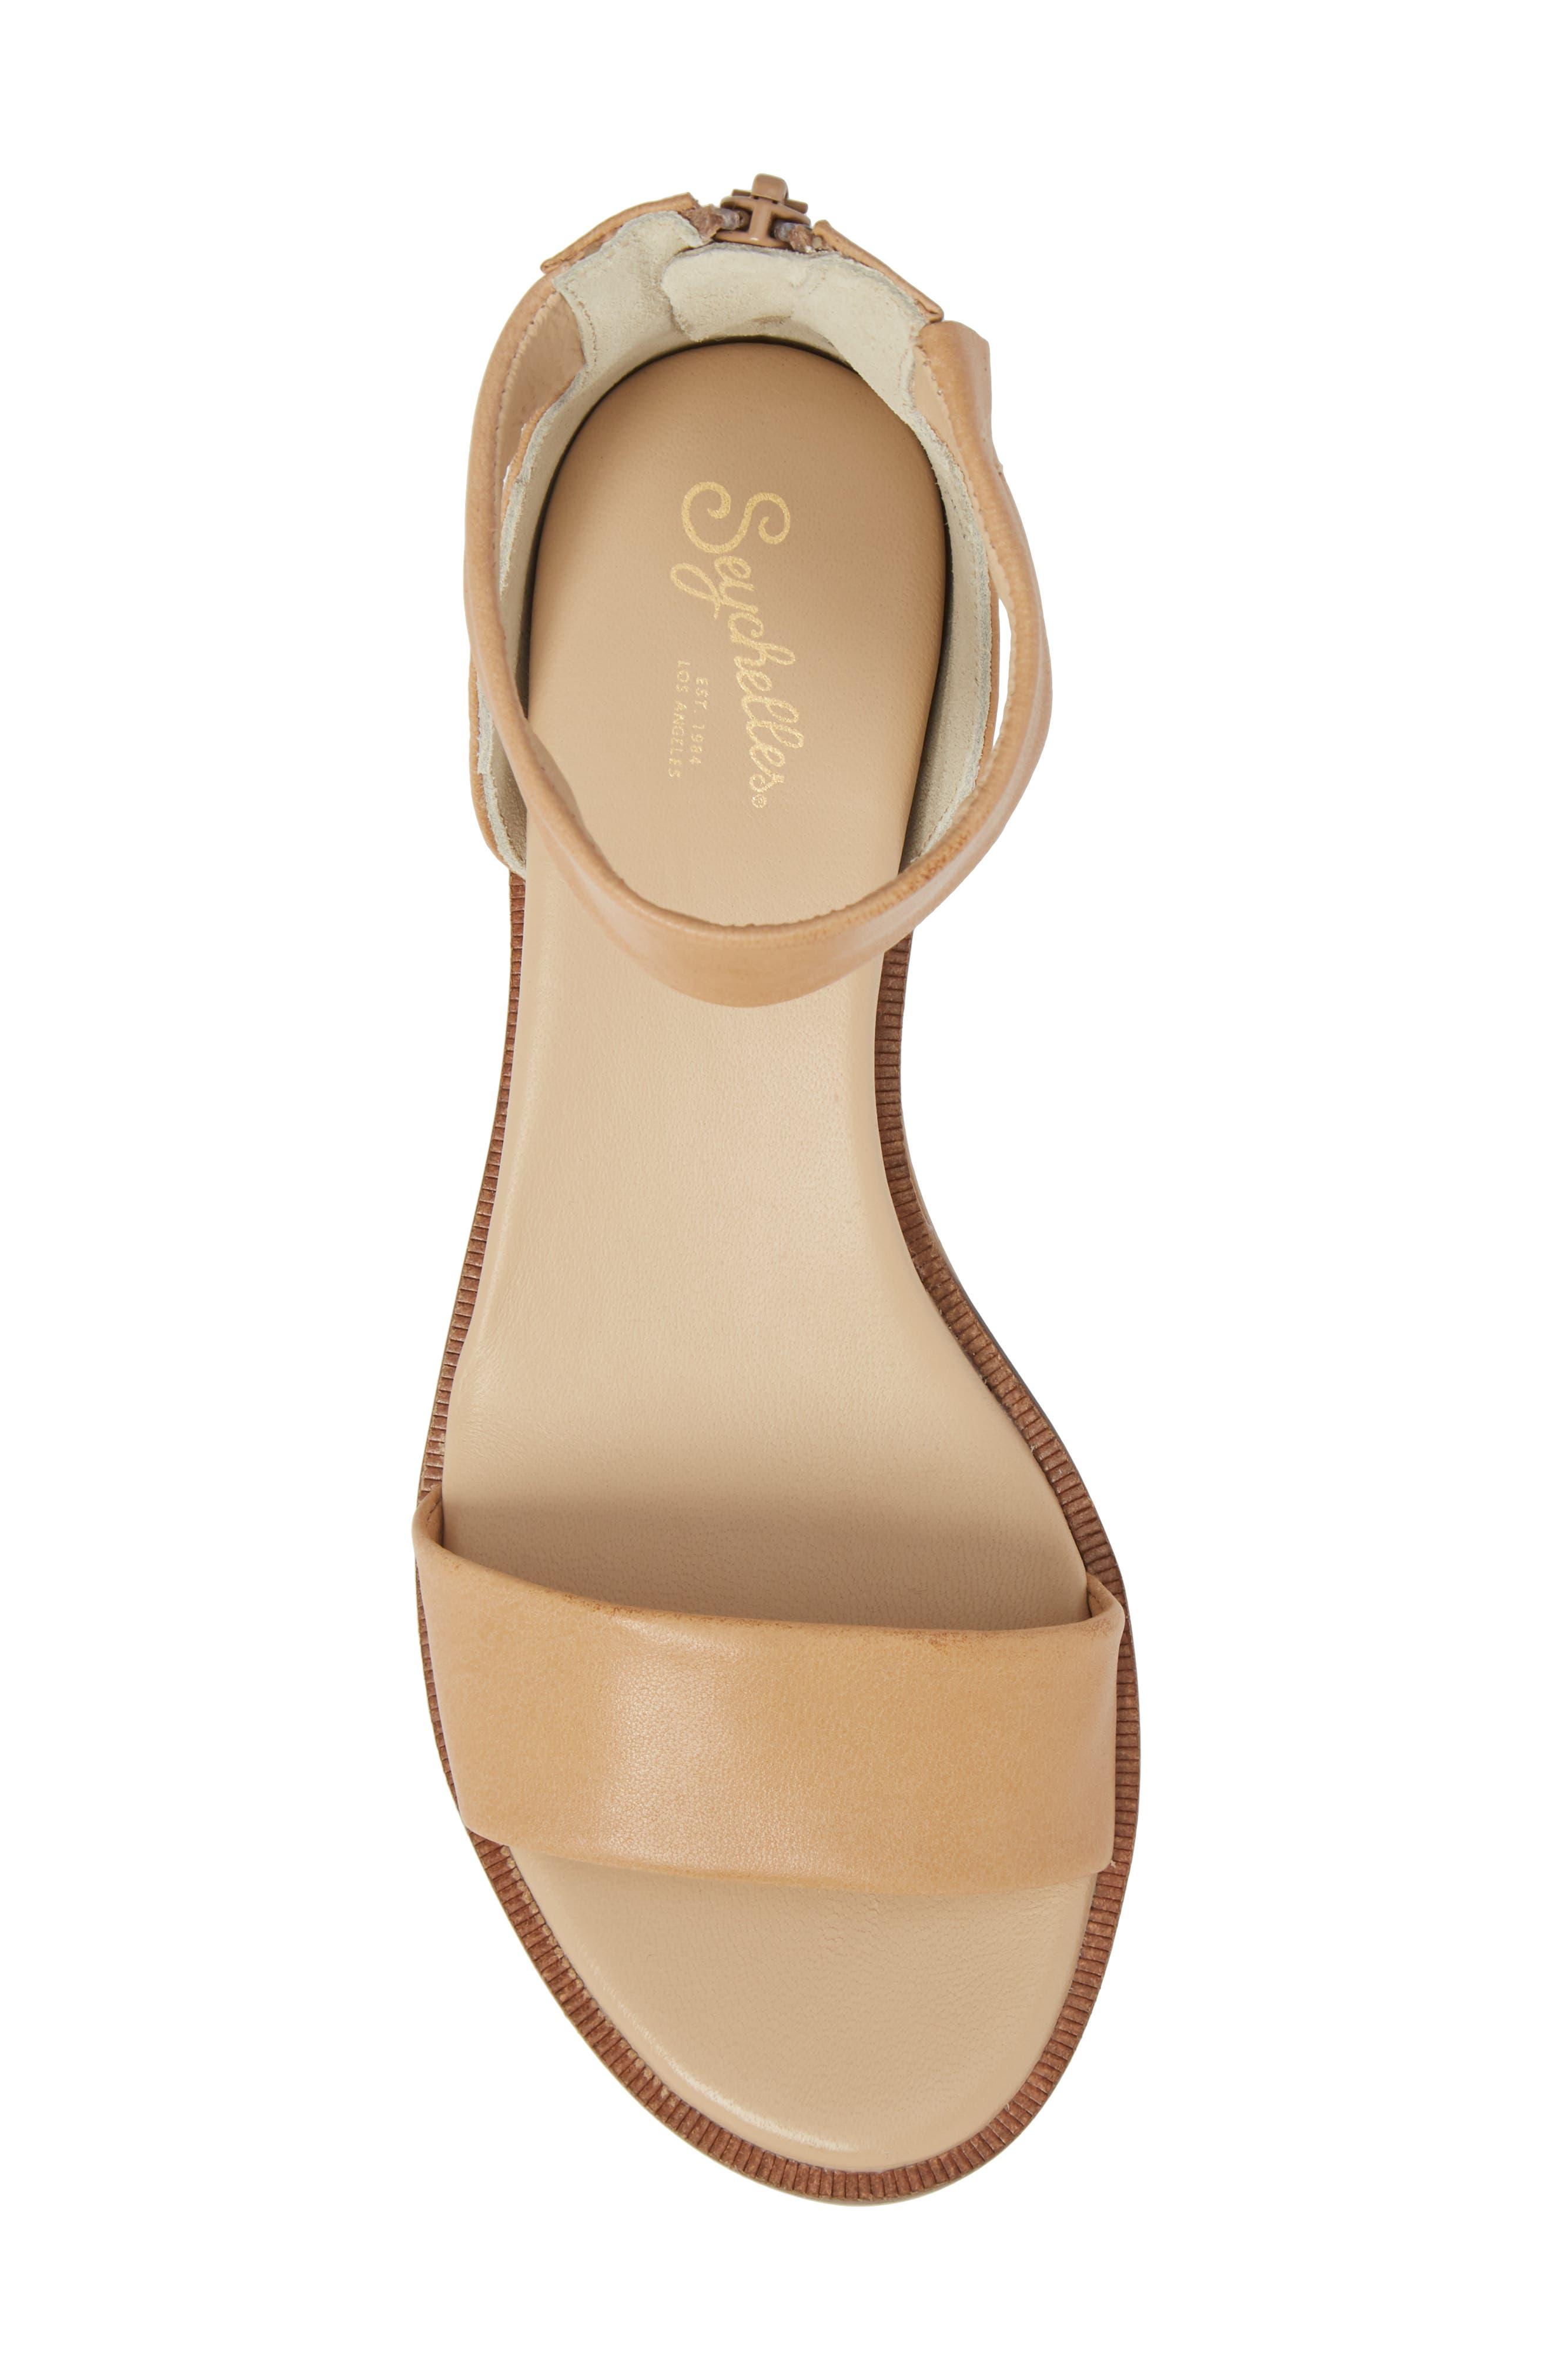 Ankle Strap Sandal,                             Alternate thumbnail 5, color,                             VACCHETTA LEATHER